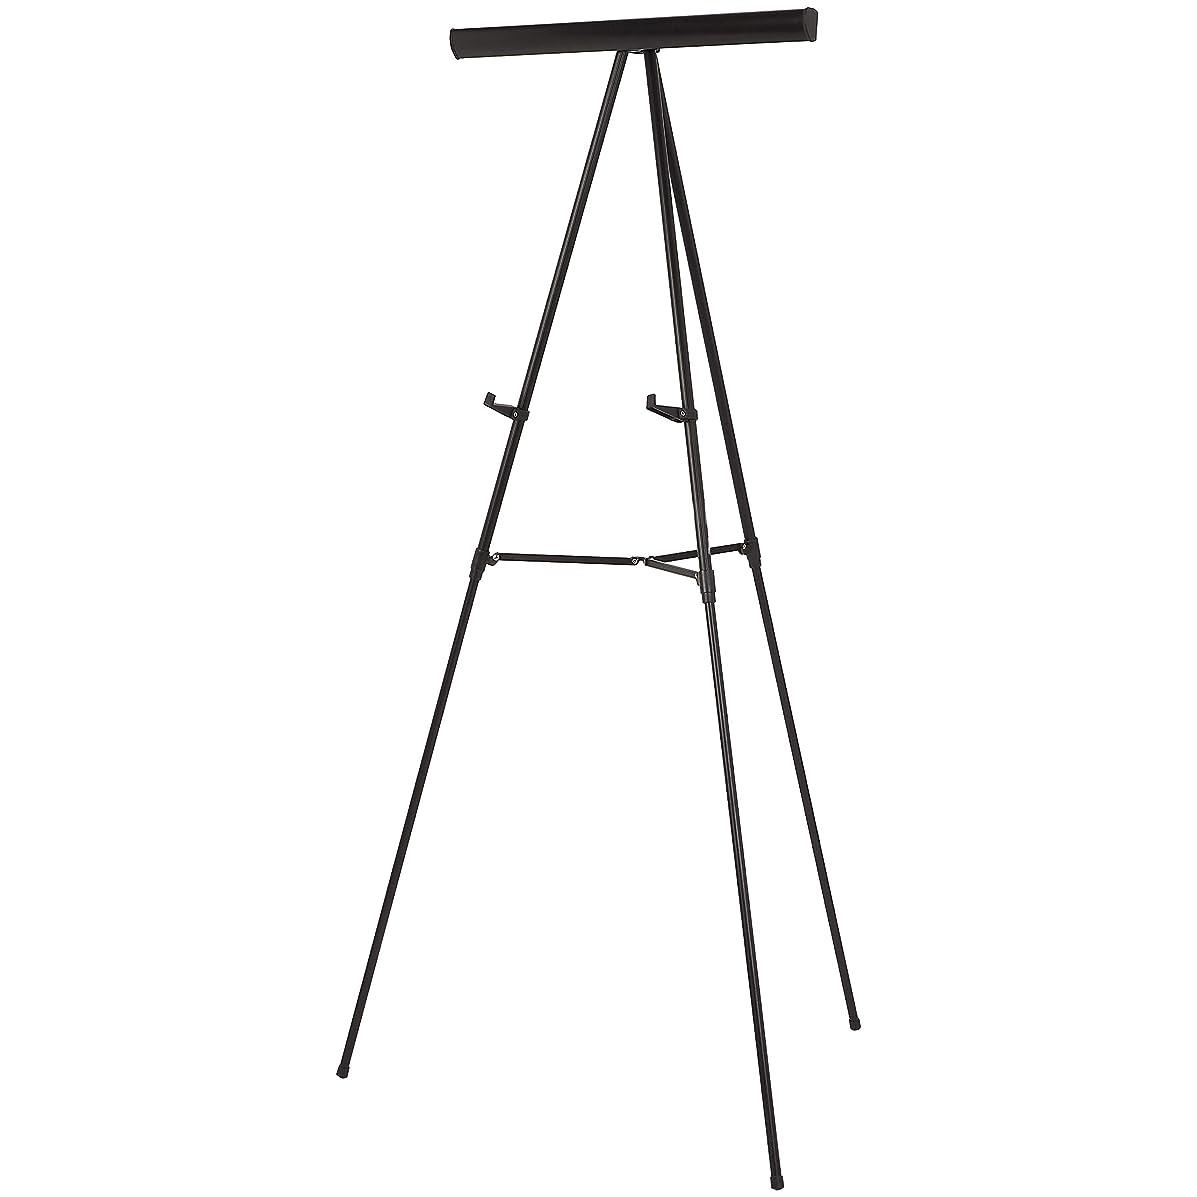 AmazonBasics Presentation Display Easel Stand, Adjustable Height Telescope Tripod, Black